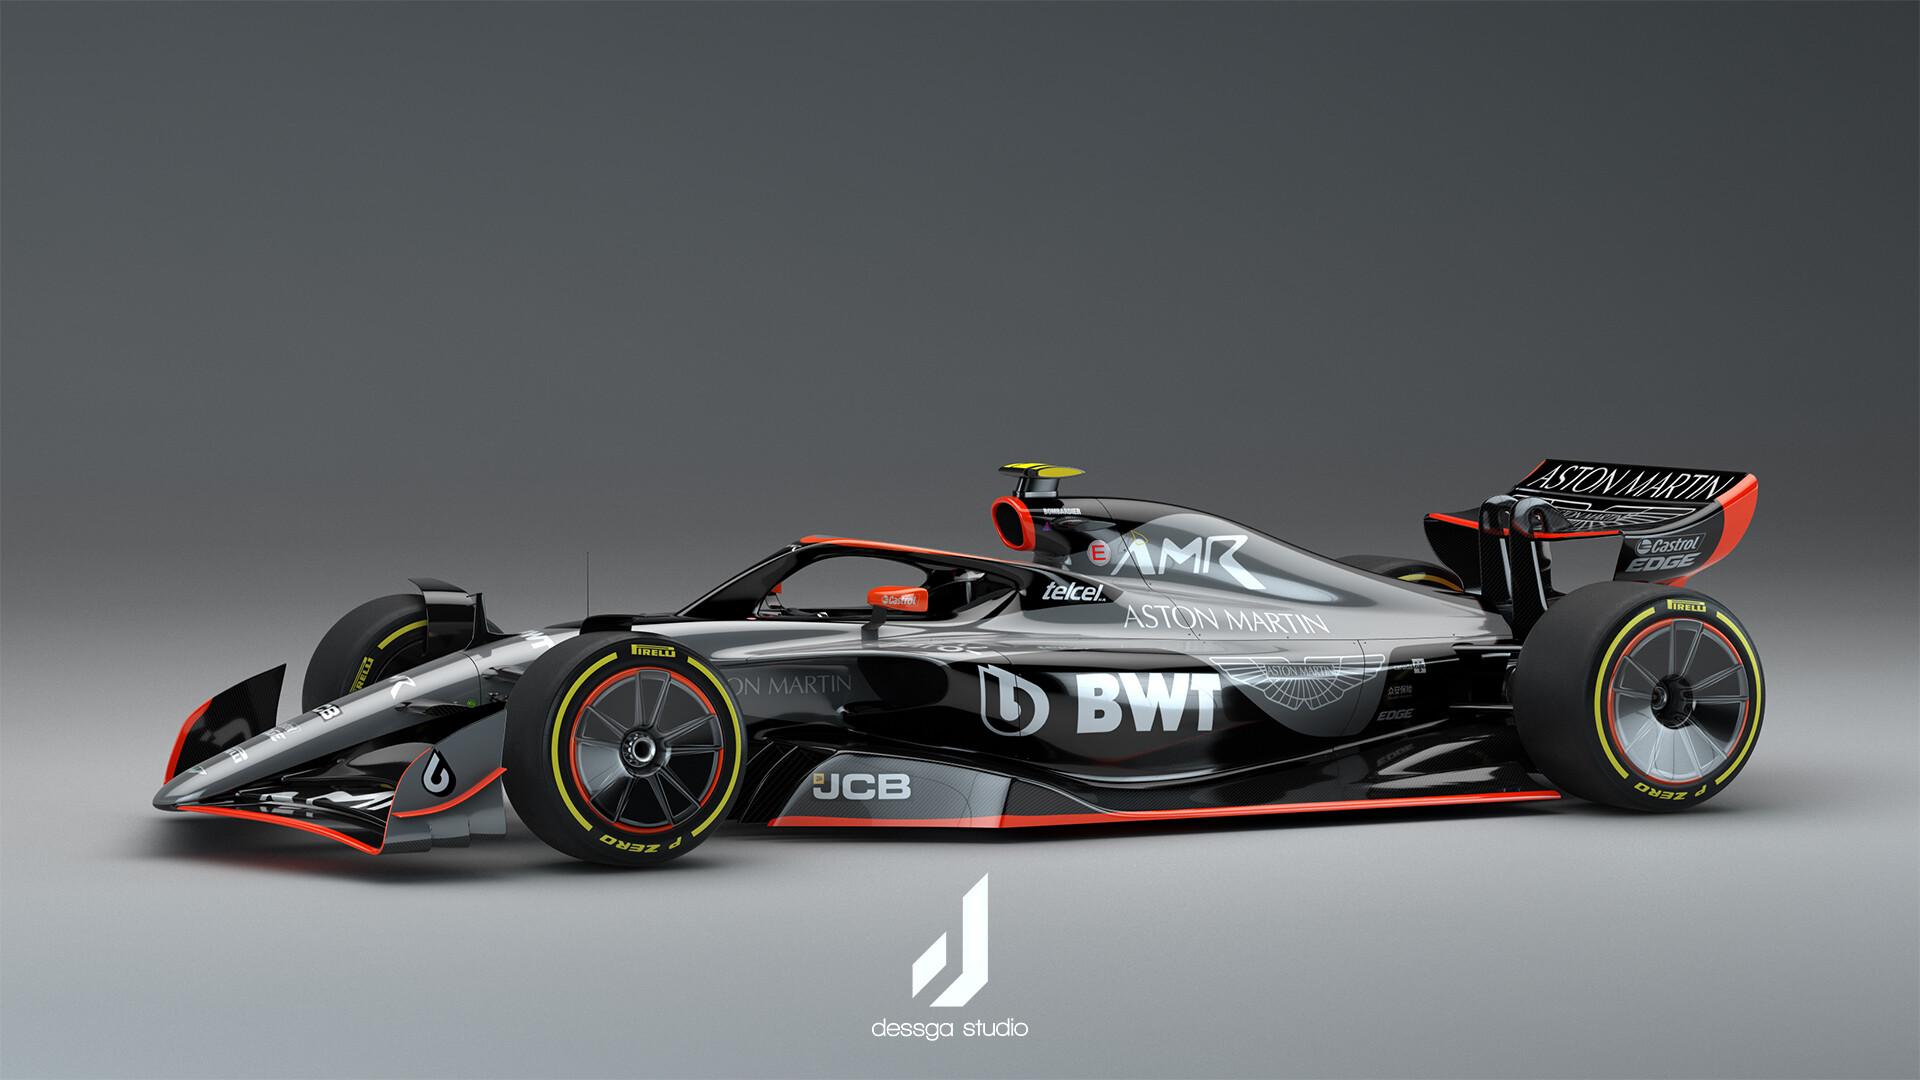 Dessga Arturo Garcia Aston Martin Formula 1 2022 Livery Concepts